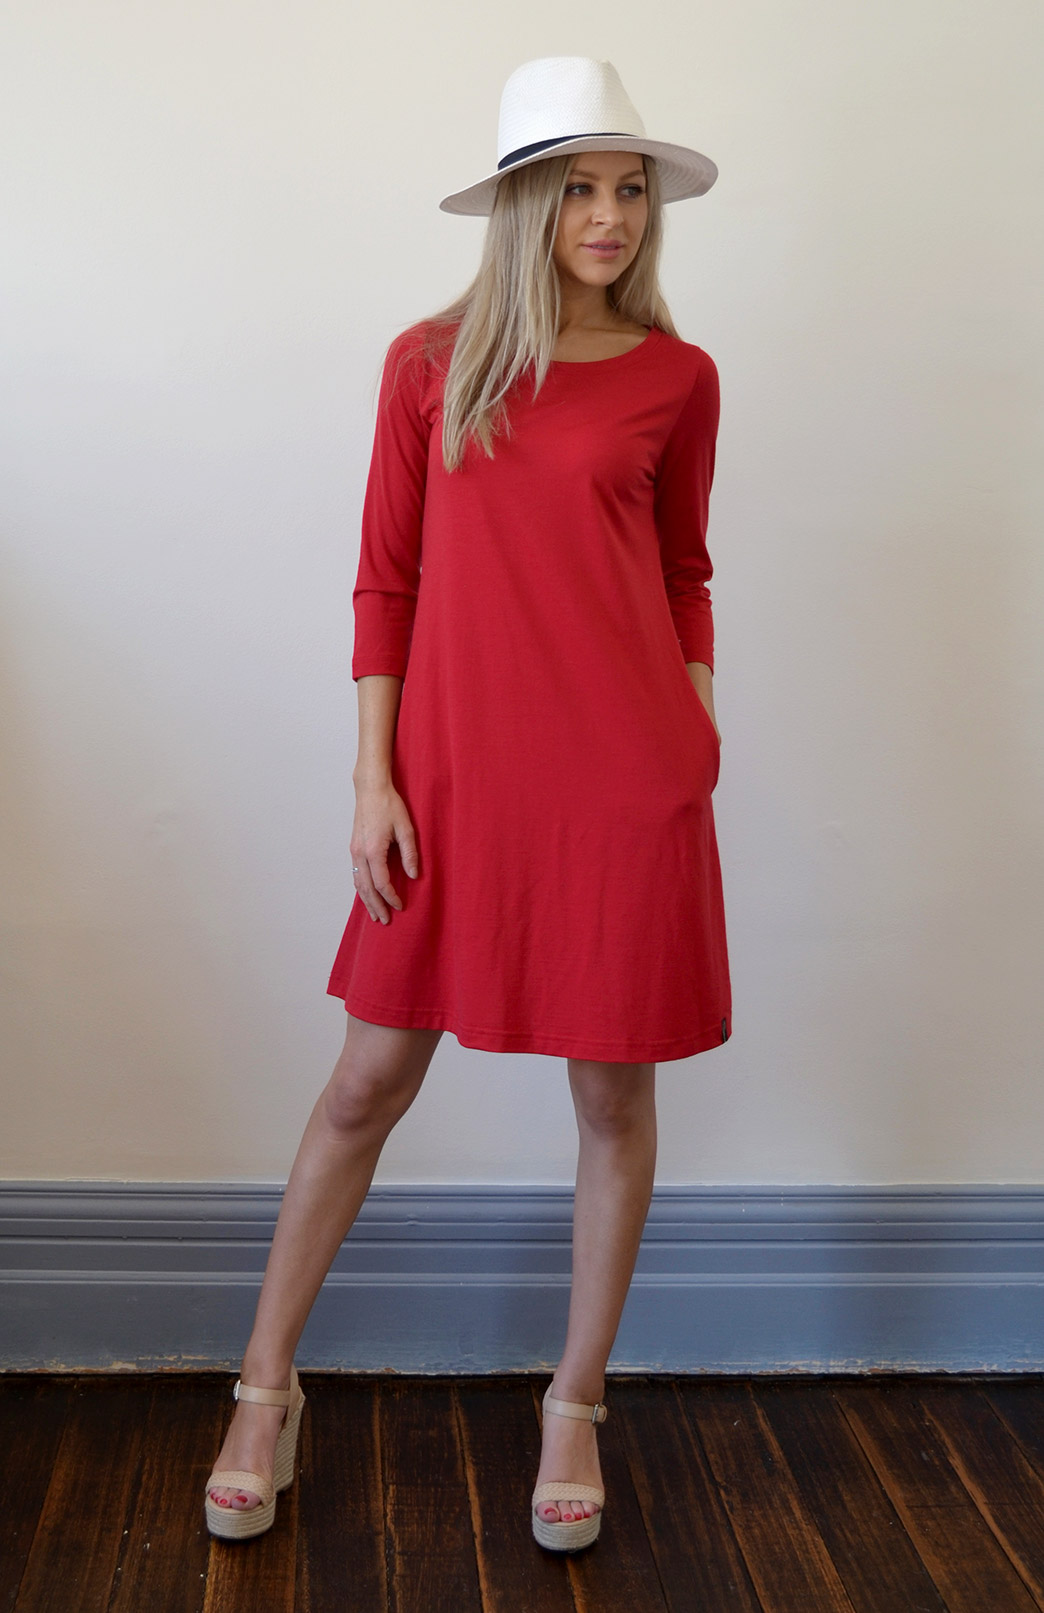 Ellie Swing Dress - Women's Red Superfine Merino Wool Swing Dress - Smitten Merino Tasmania Australia